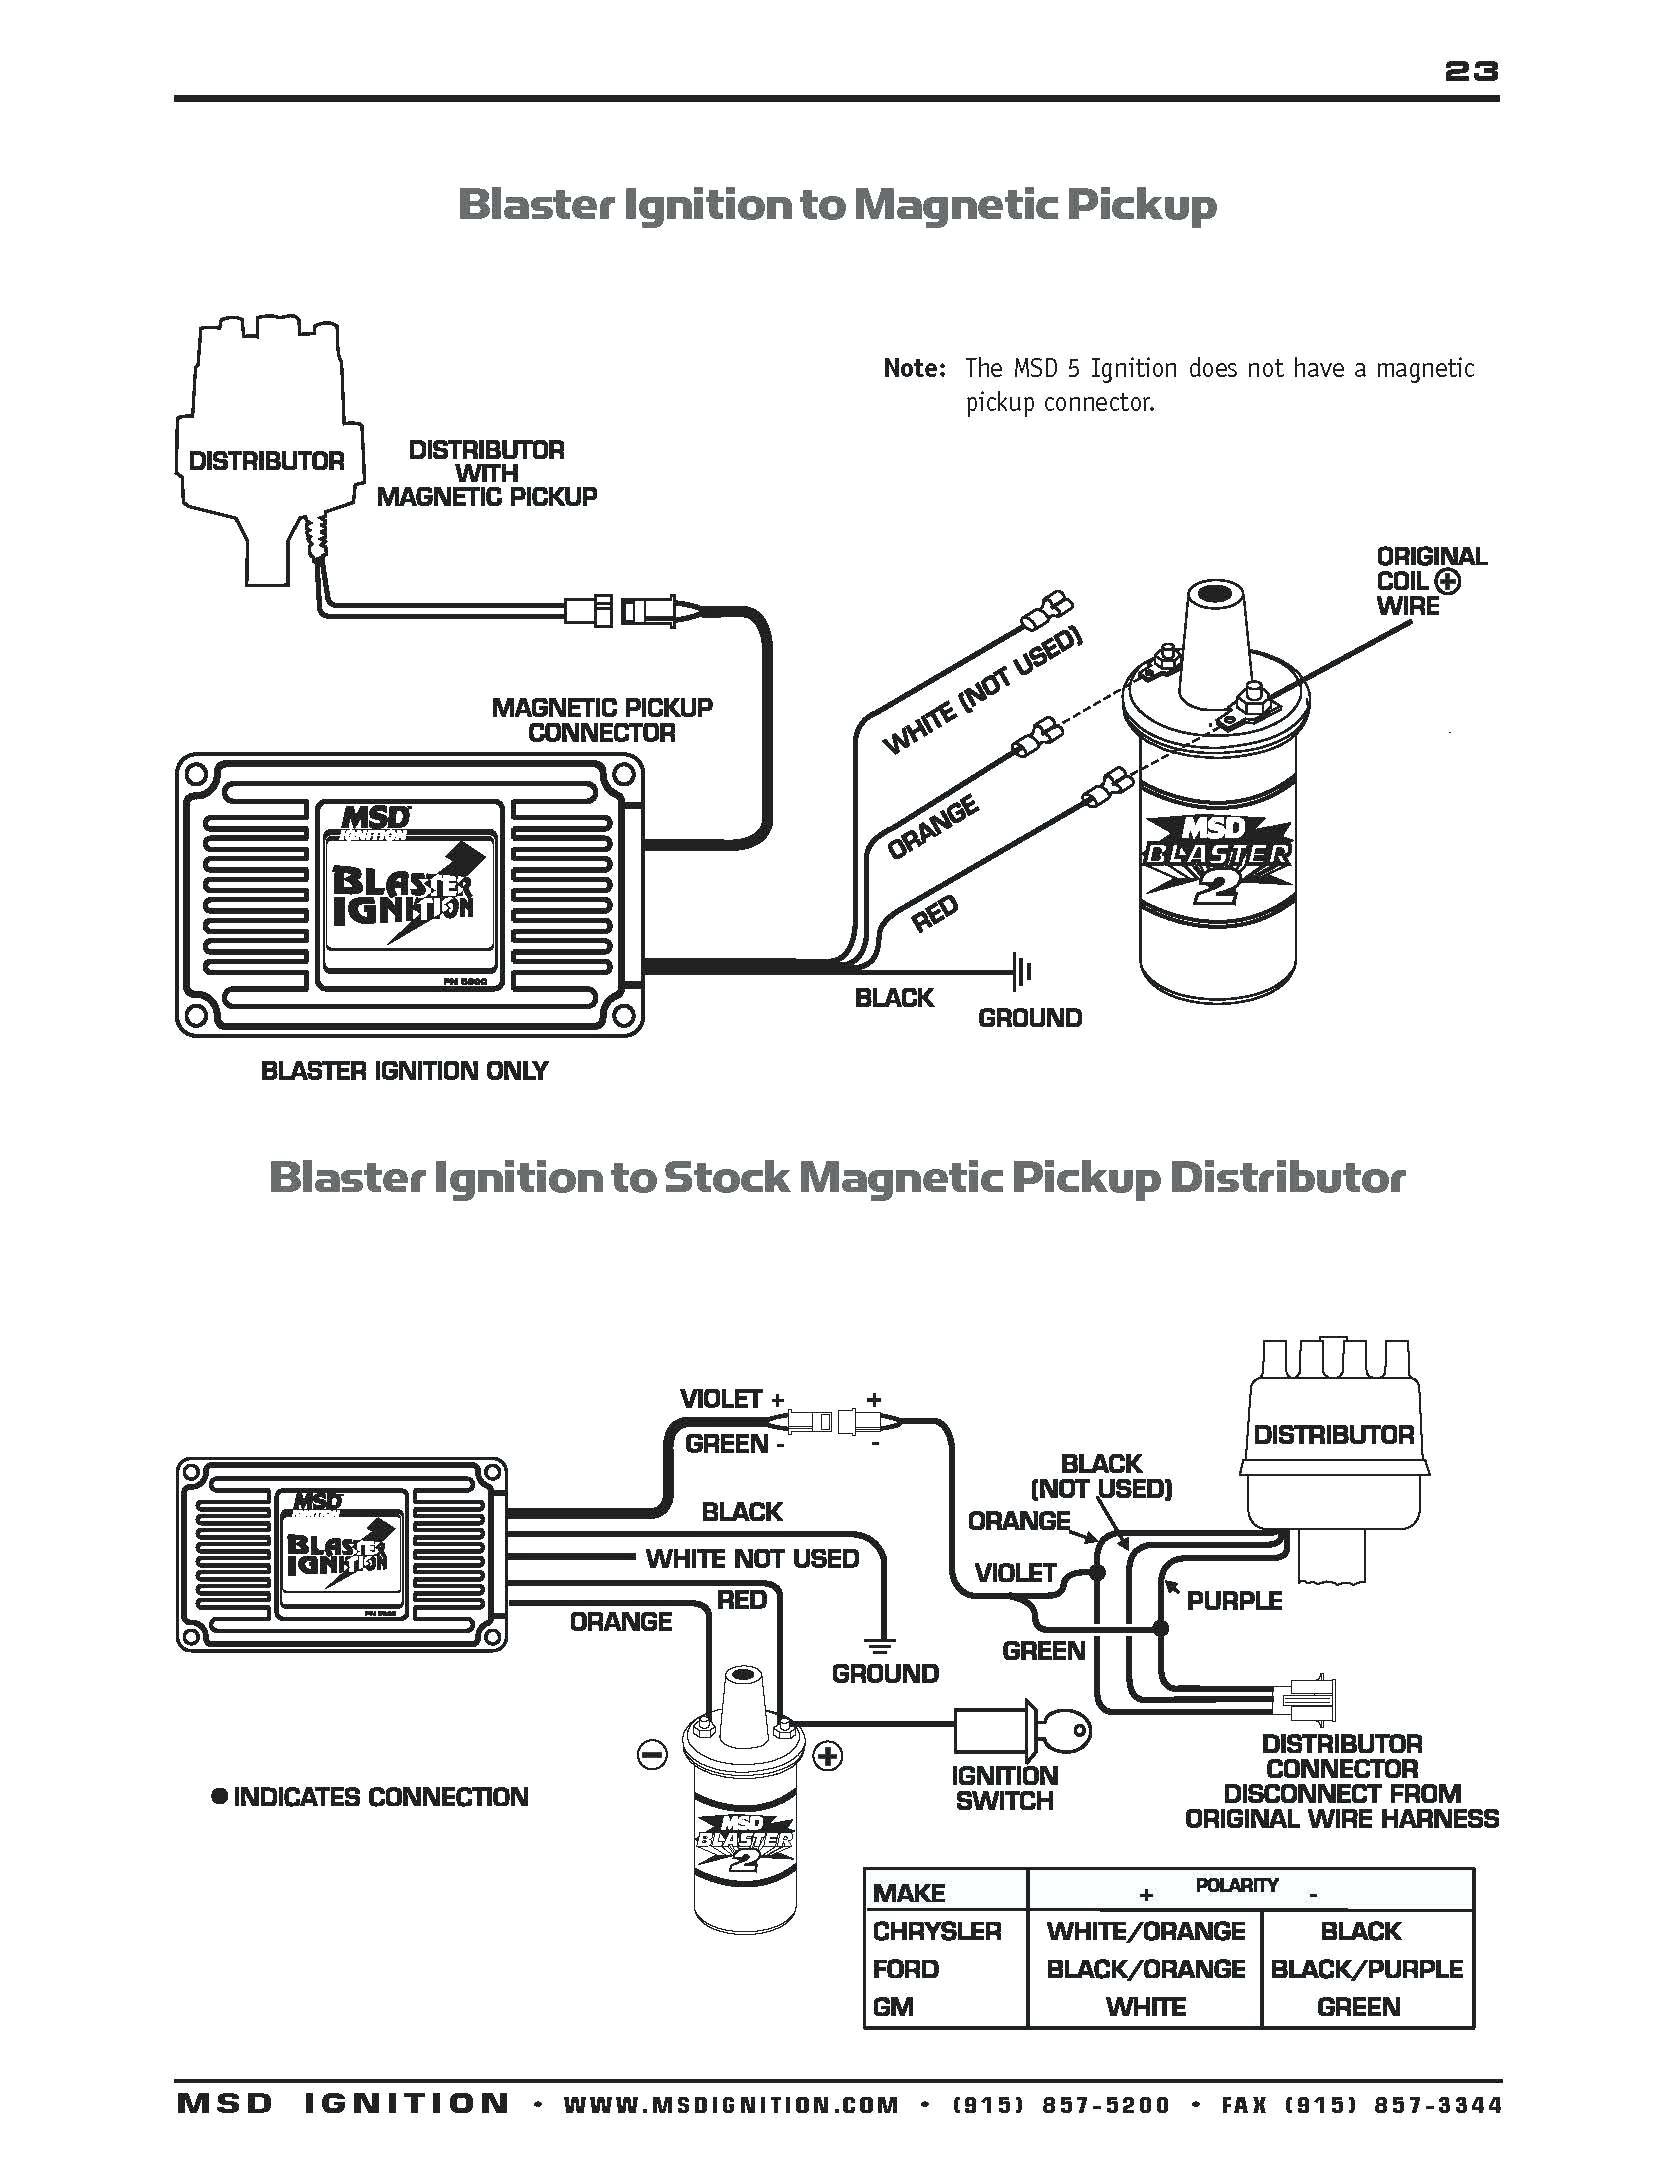 msd ignition 6al 6420 wiring diagram diagram msd 6al 6420 wiring new ignition 6al katherinemarie me in 7a jpg